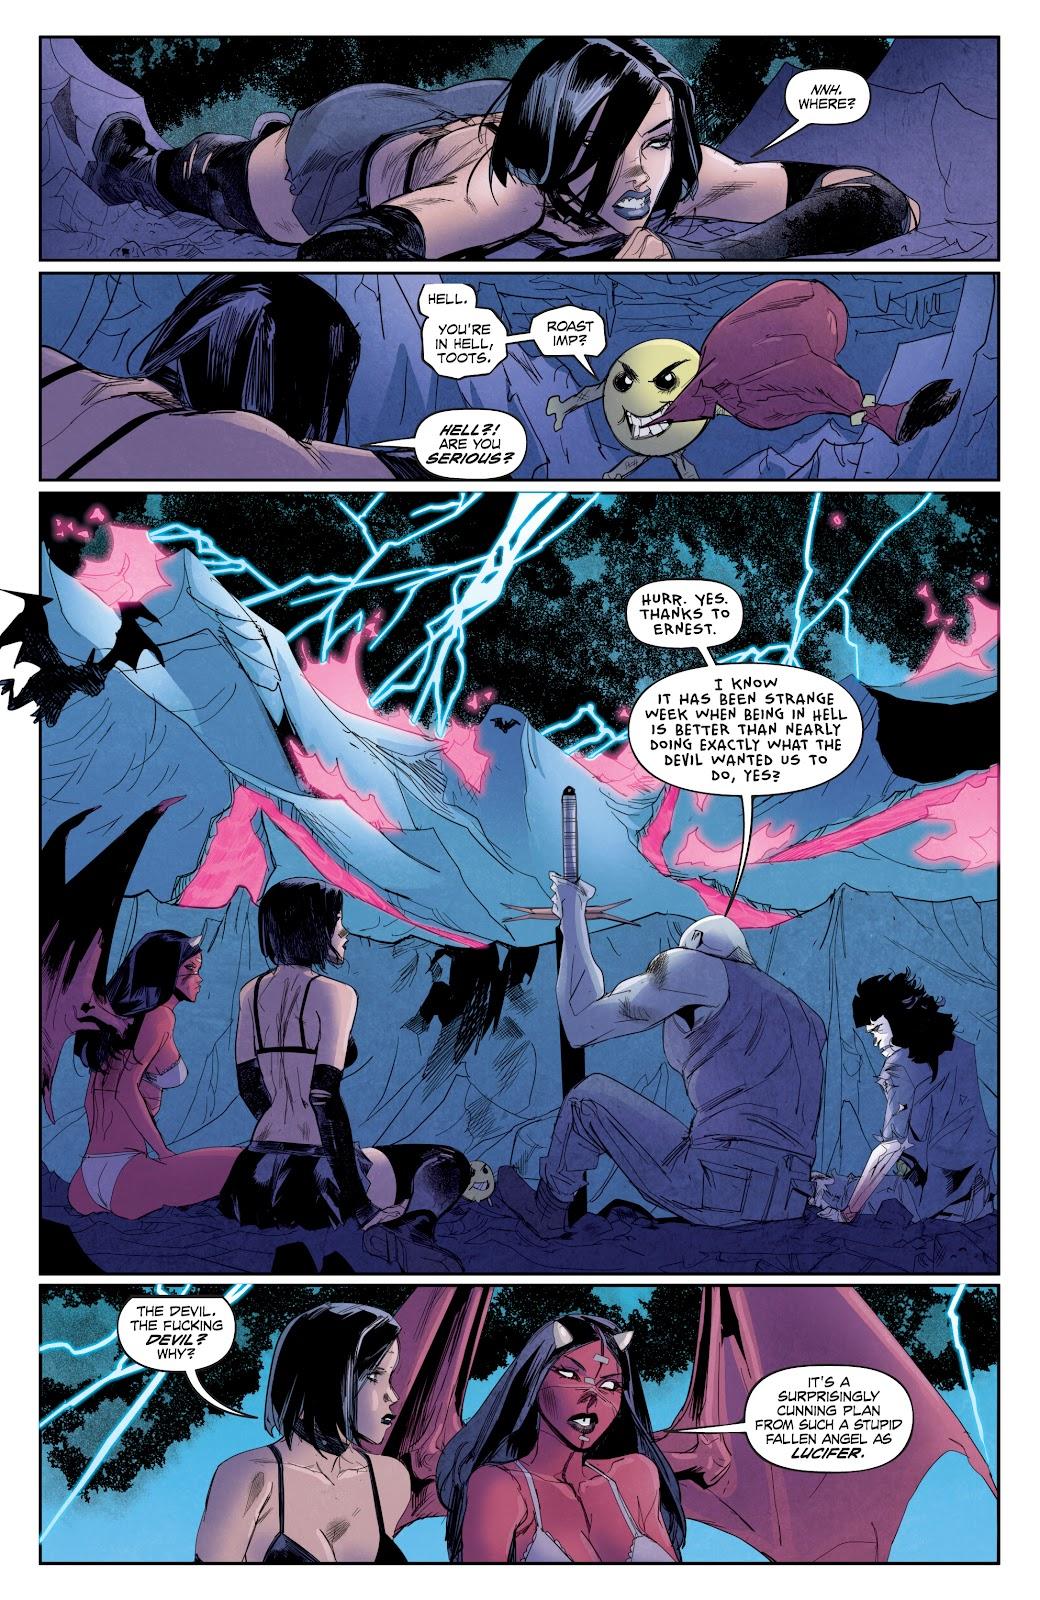 Read online Hack/Slash vs. Chaos comic -  Issue #4 - 21